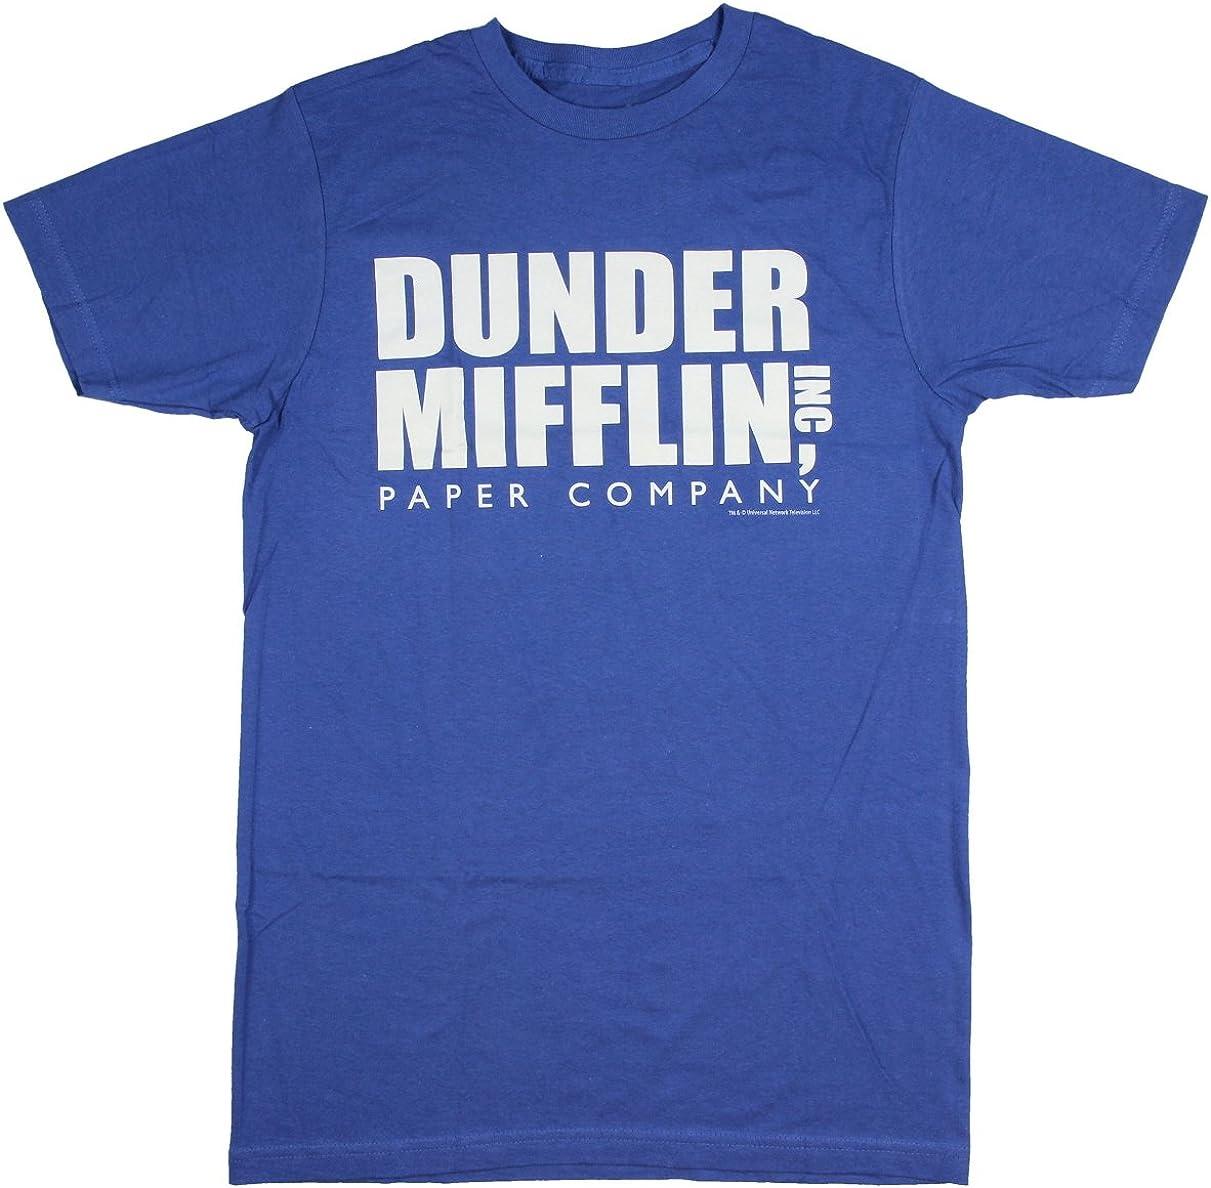 DUNDER MIFFLIN PAPER COMPANY T-Shirts